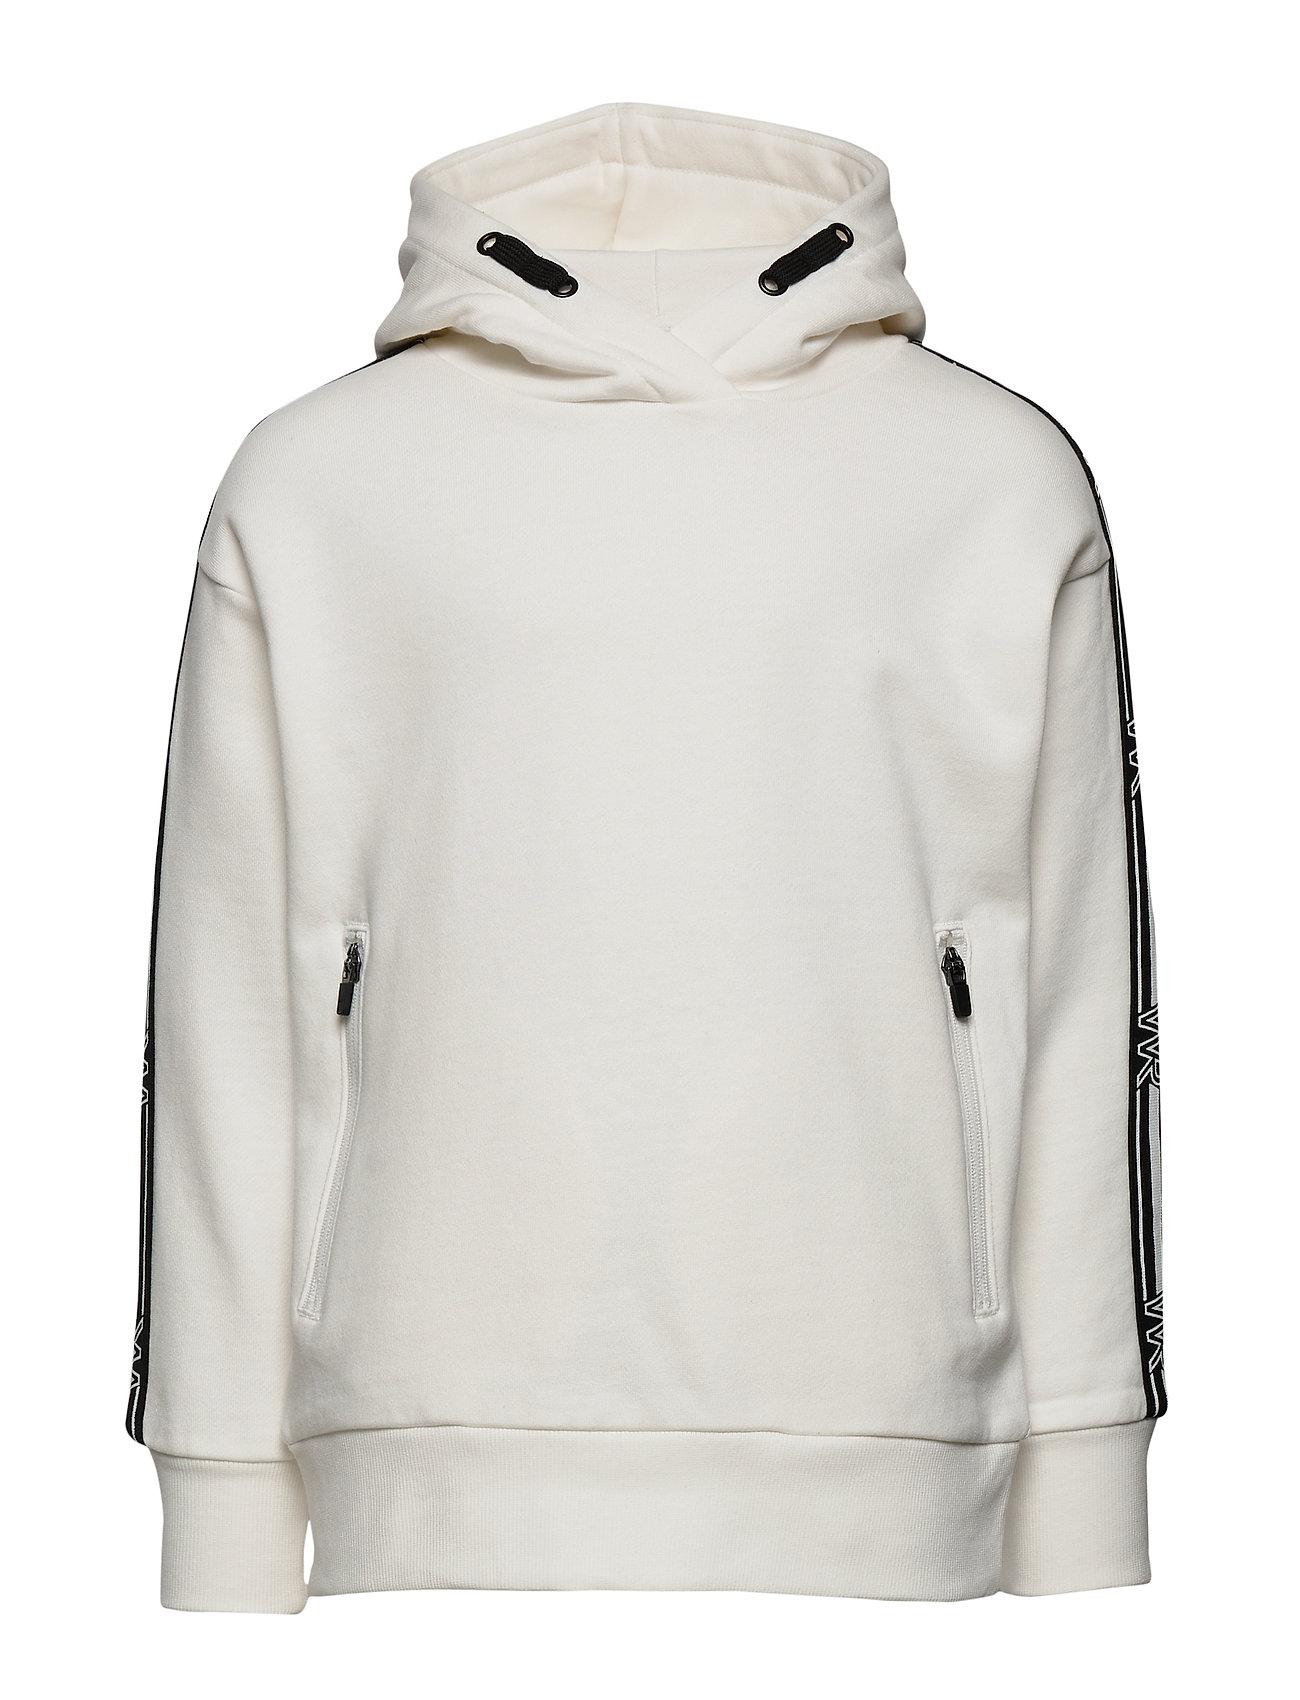 Lindex Sweatshirt hoodie WR white - OFF WHITE